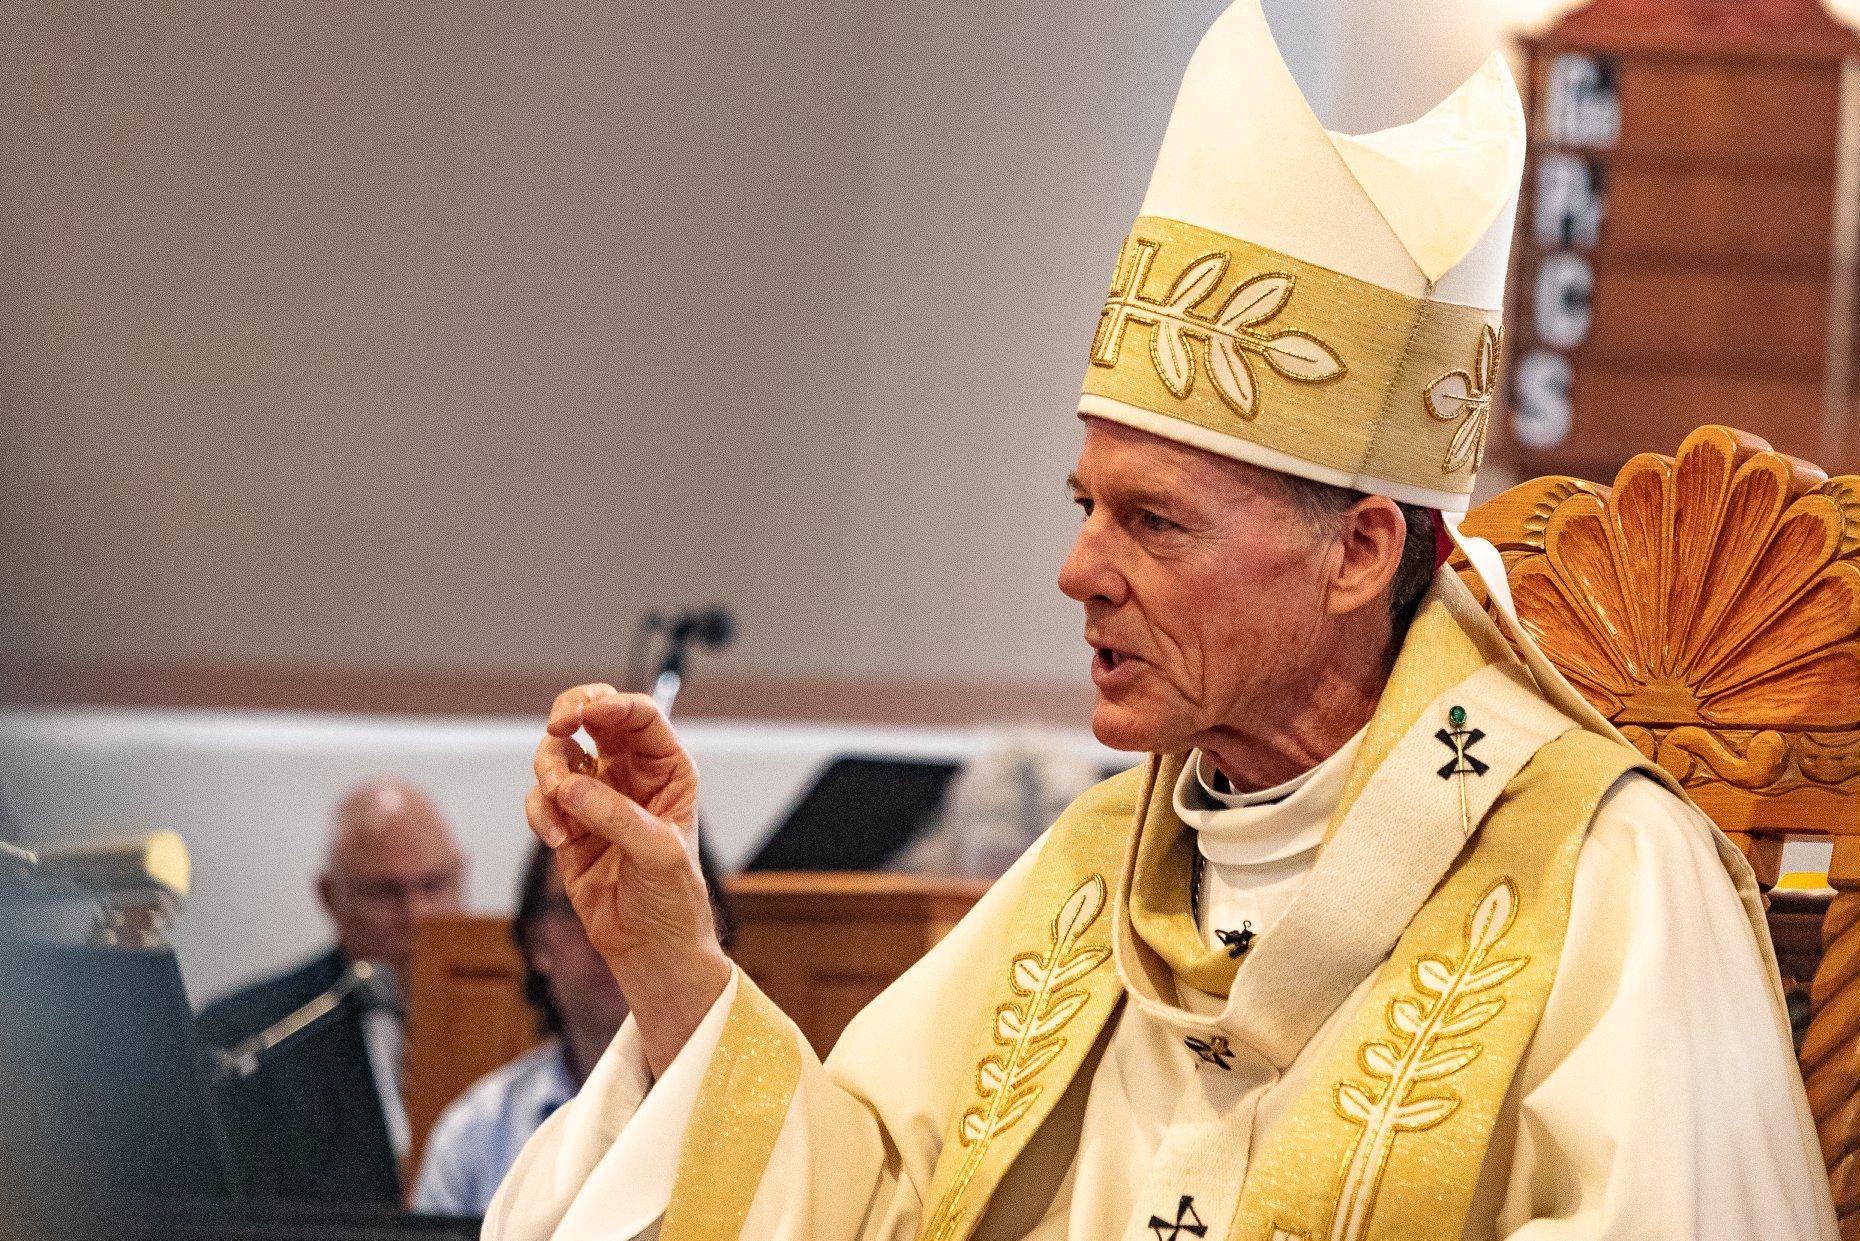 Archibishop Wester